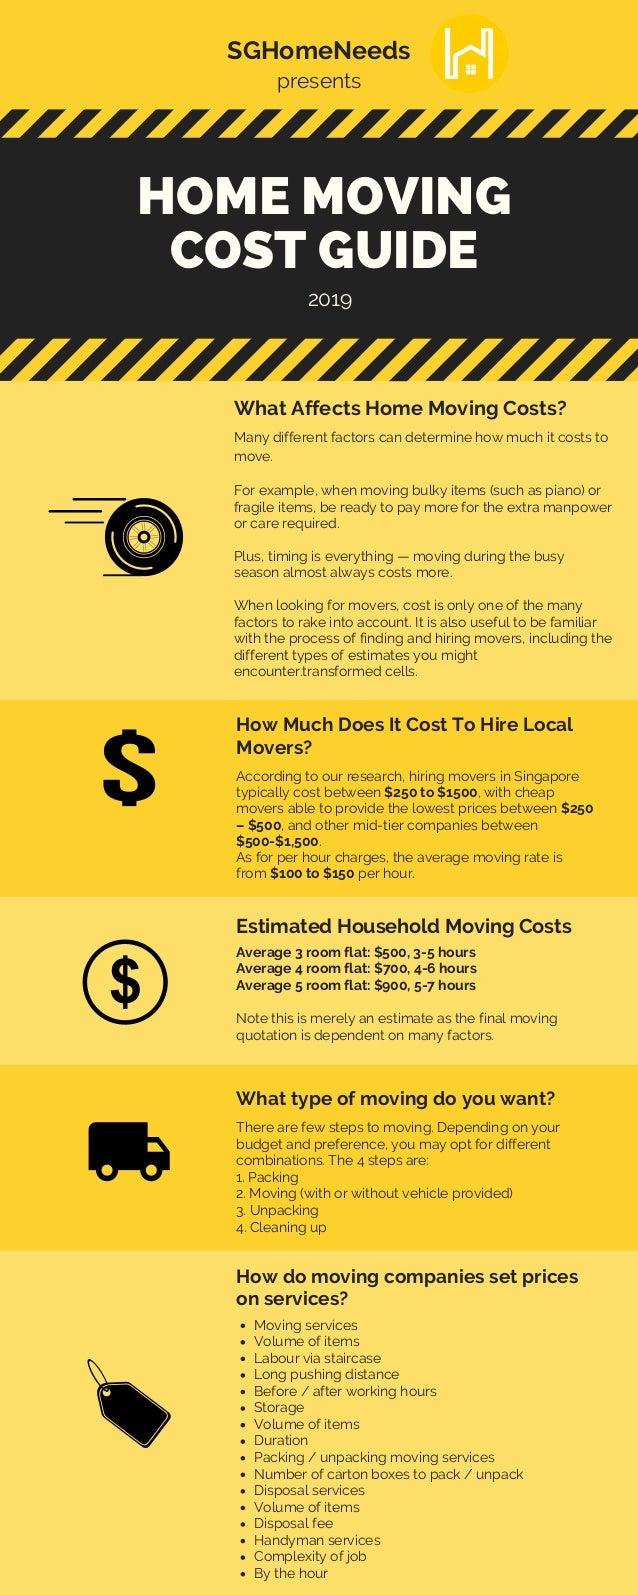 Booking A Move Online Reduces Moving ...blog.unpakt.com